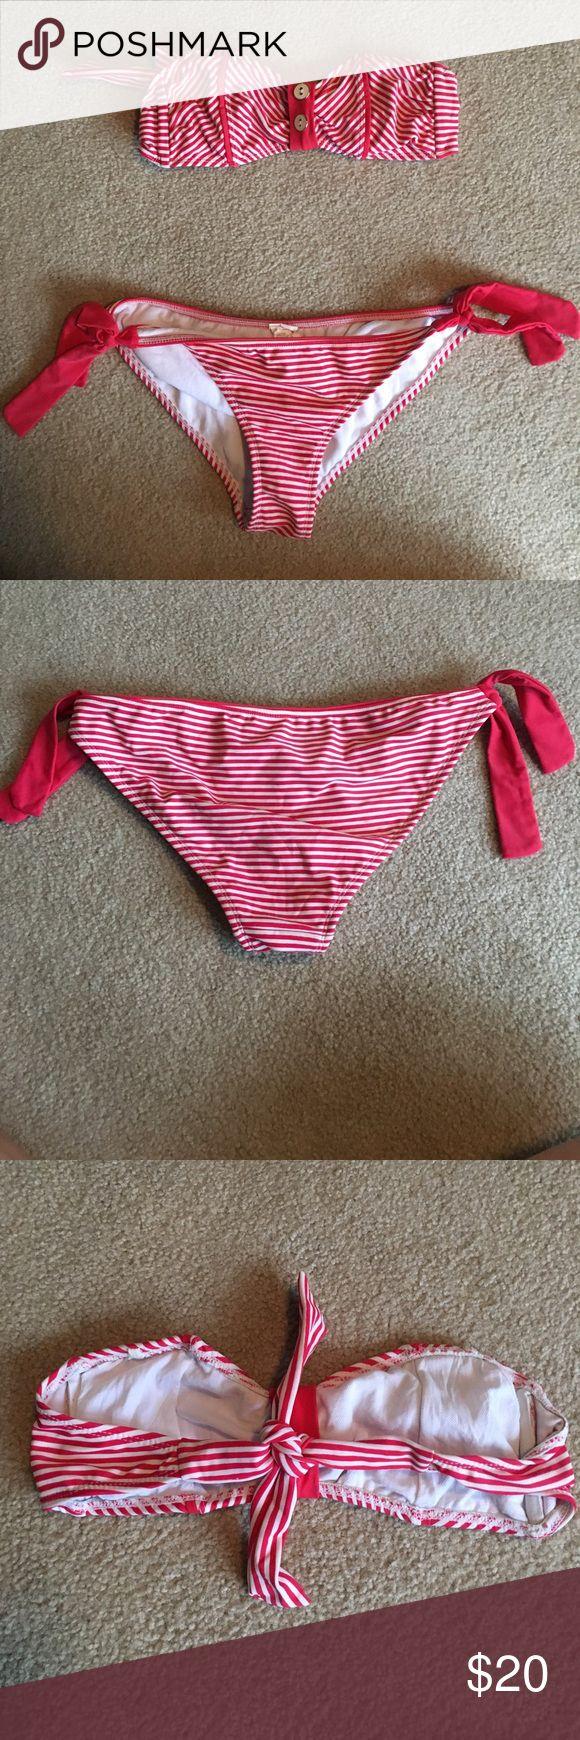 Target bikini Red and white striped bikini top size small bottoms size medium Xhilaration Swim Bikinis